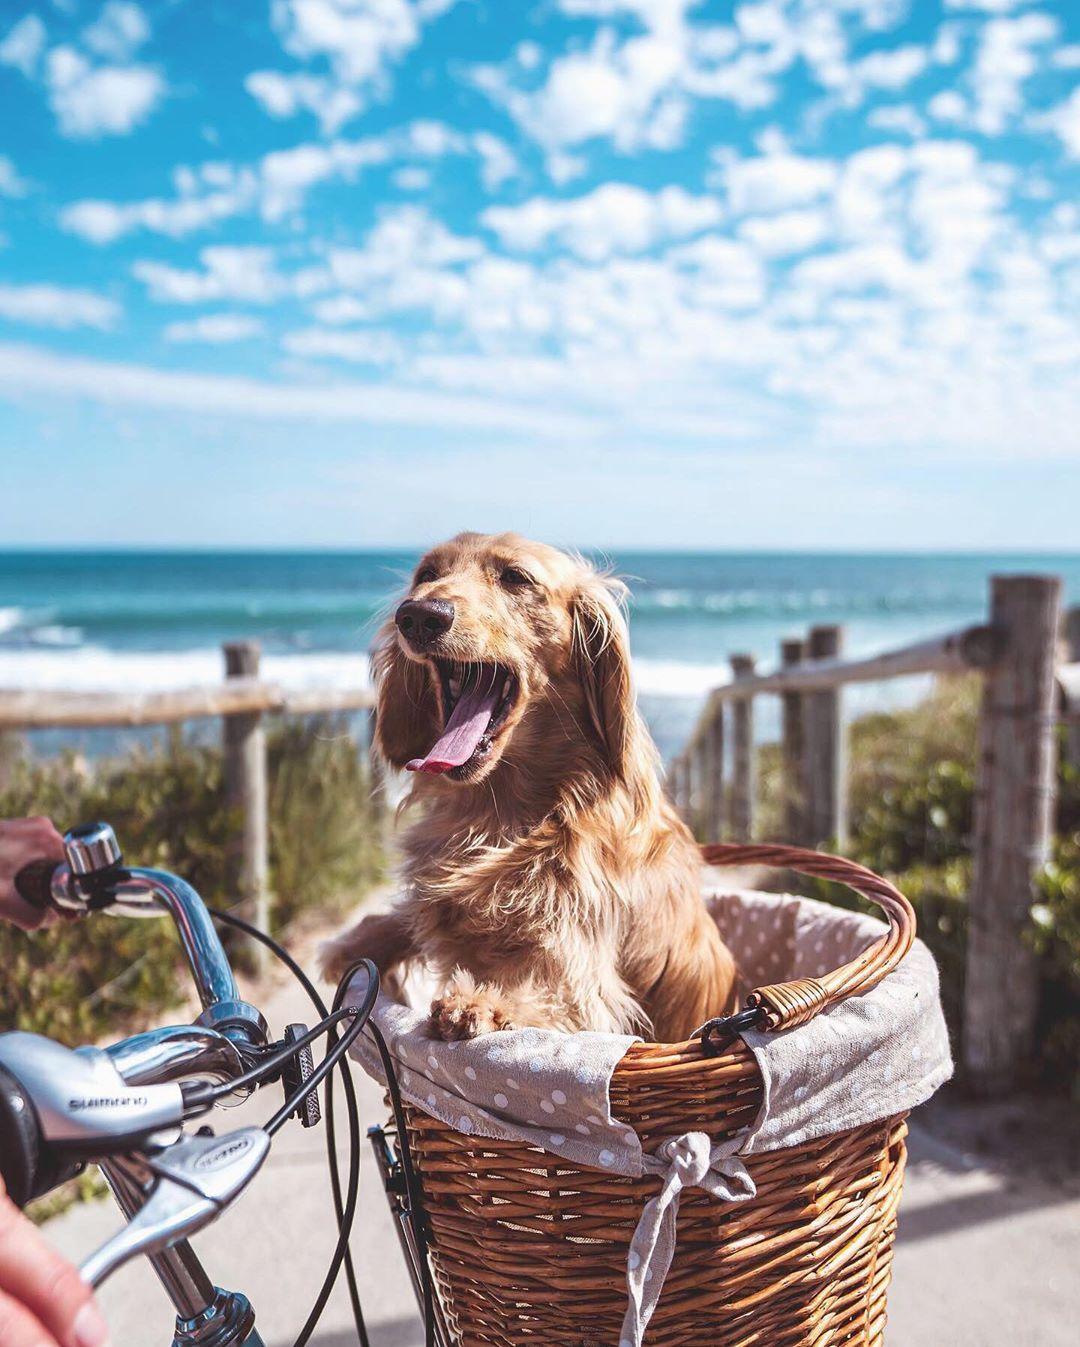 Does A Bike Ride Get Any Better Amandabisk Westisbest Triggbeach Trigg Soperth Perthnow In 2020 Sorrento Beach Beach Resorts Australia Travel